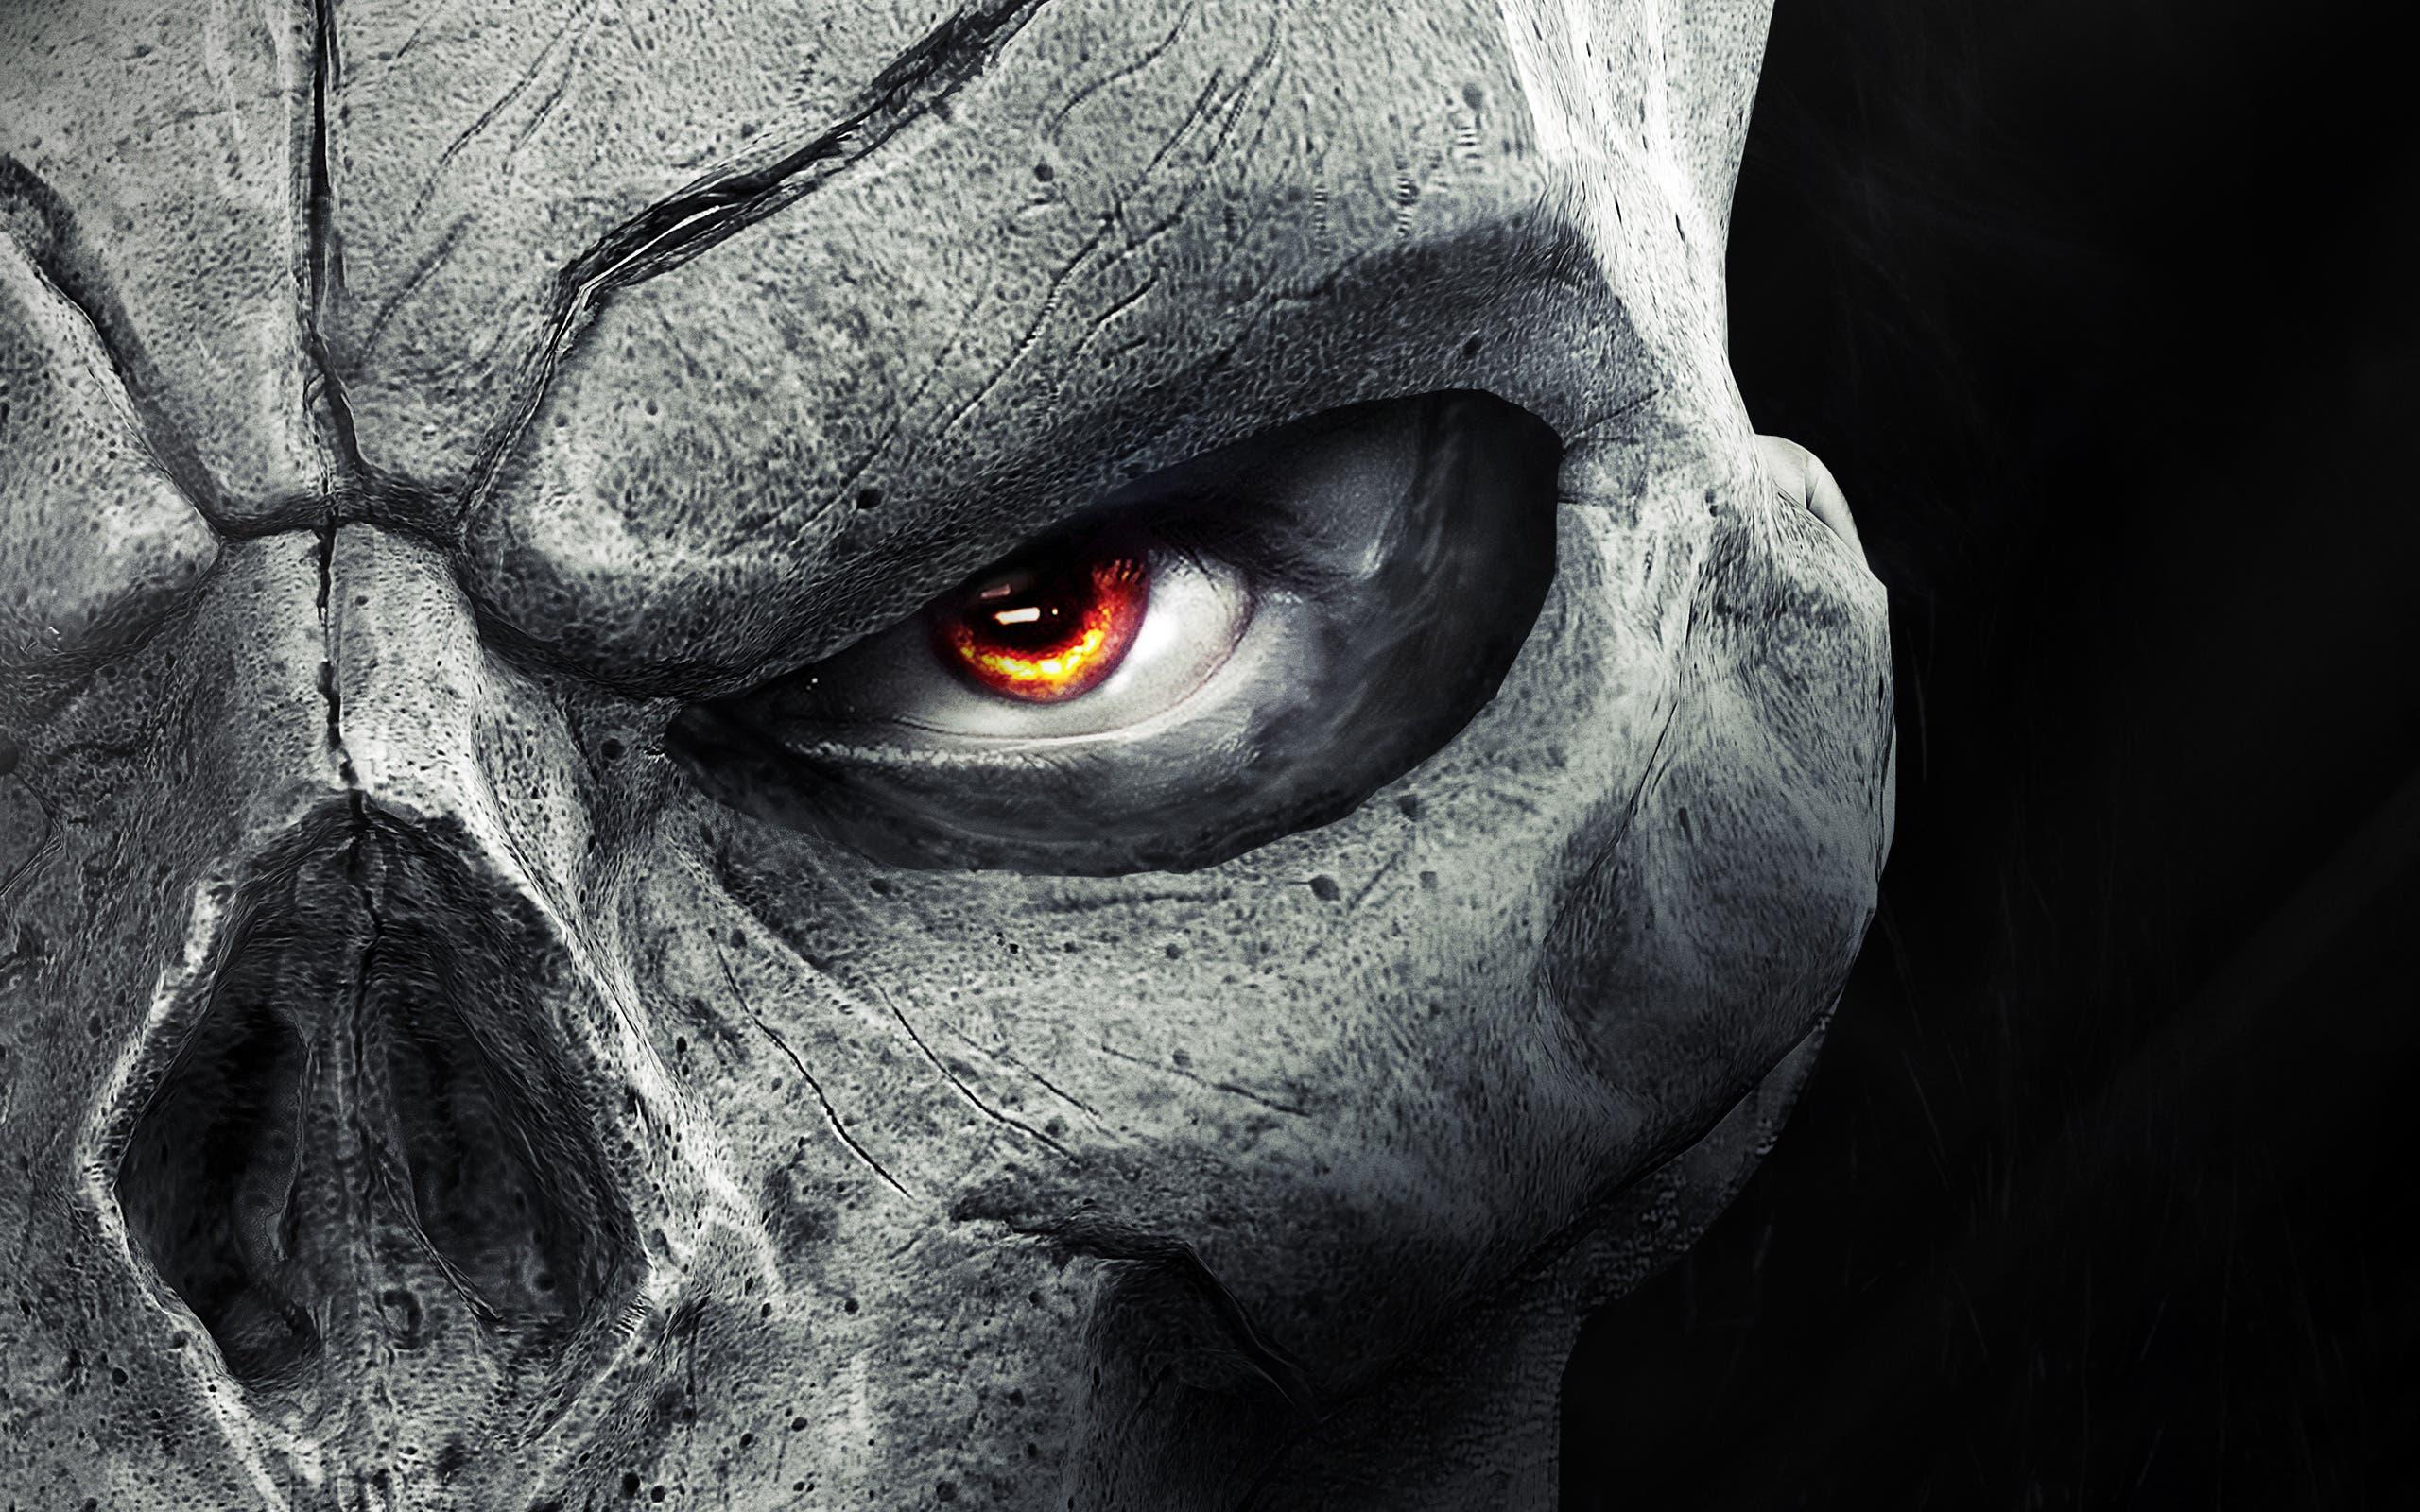 darksiders-2-screen-wallpaper